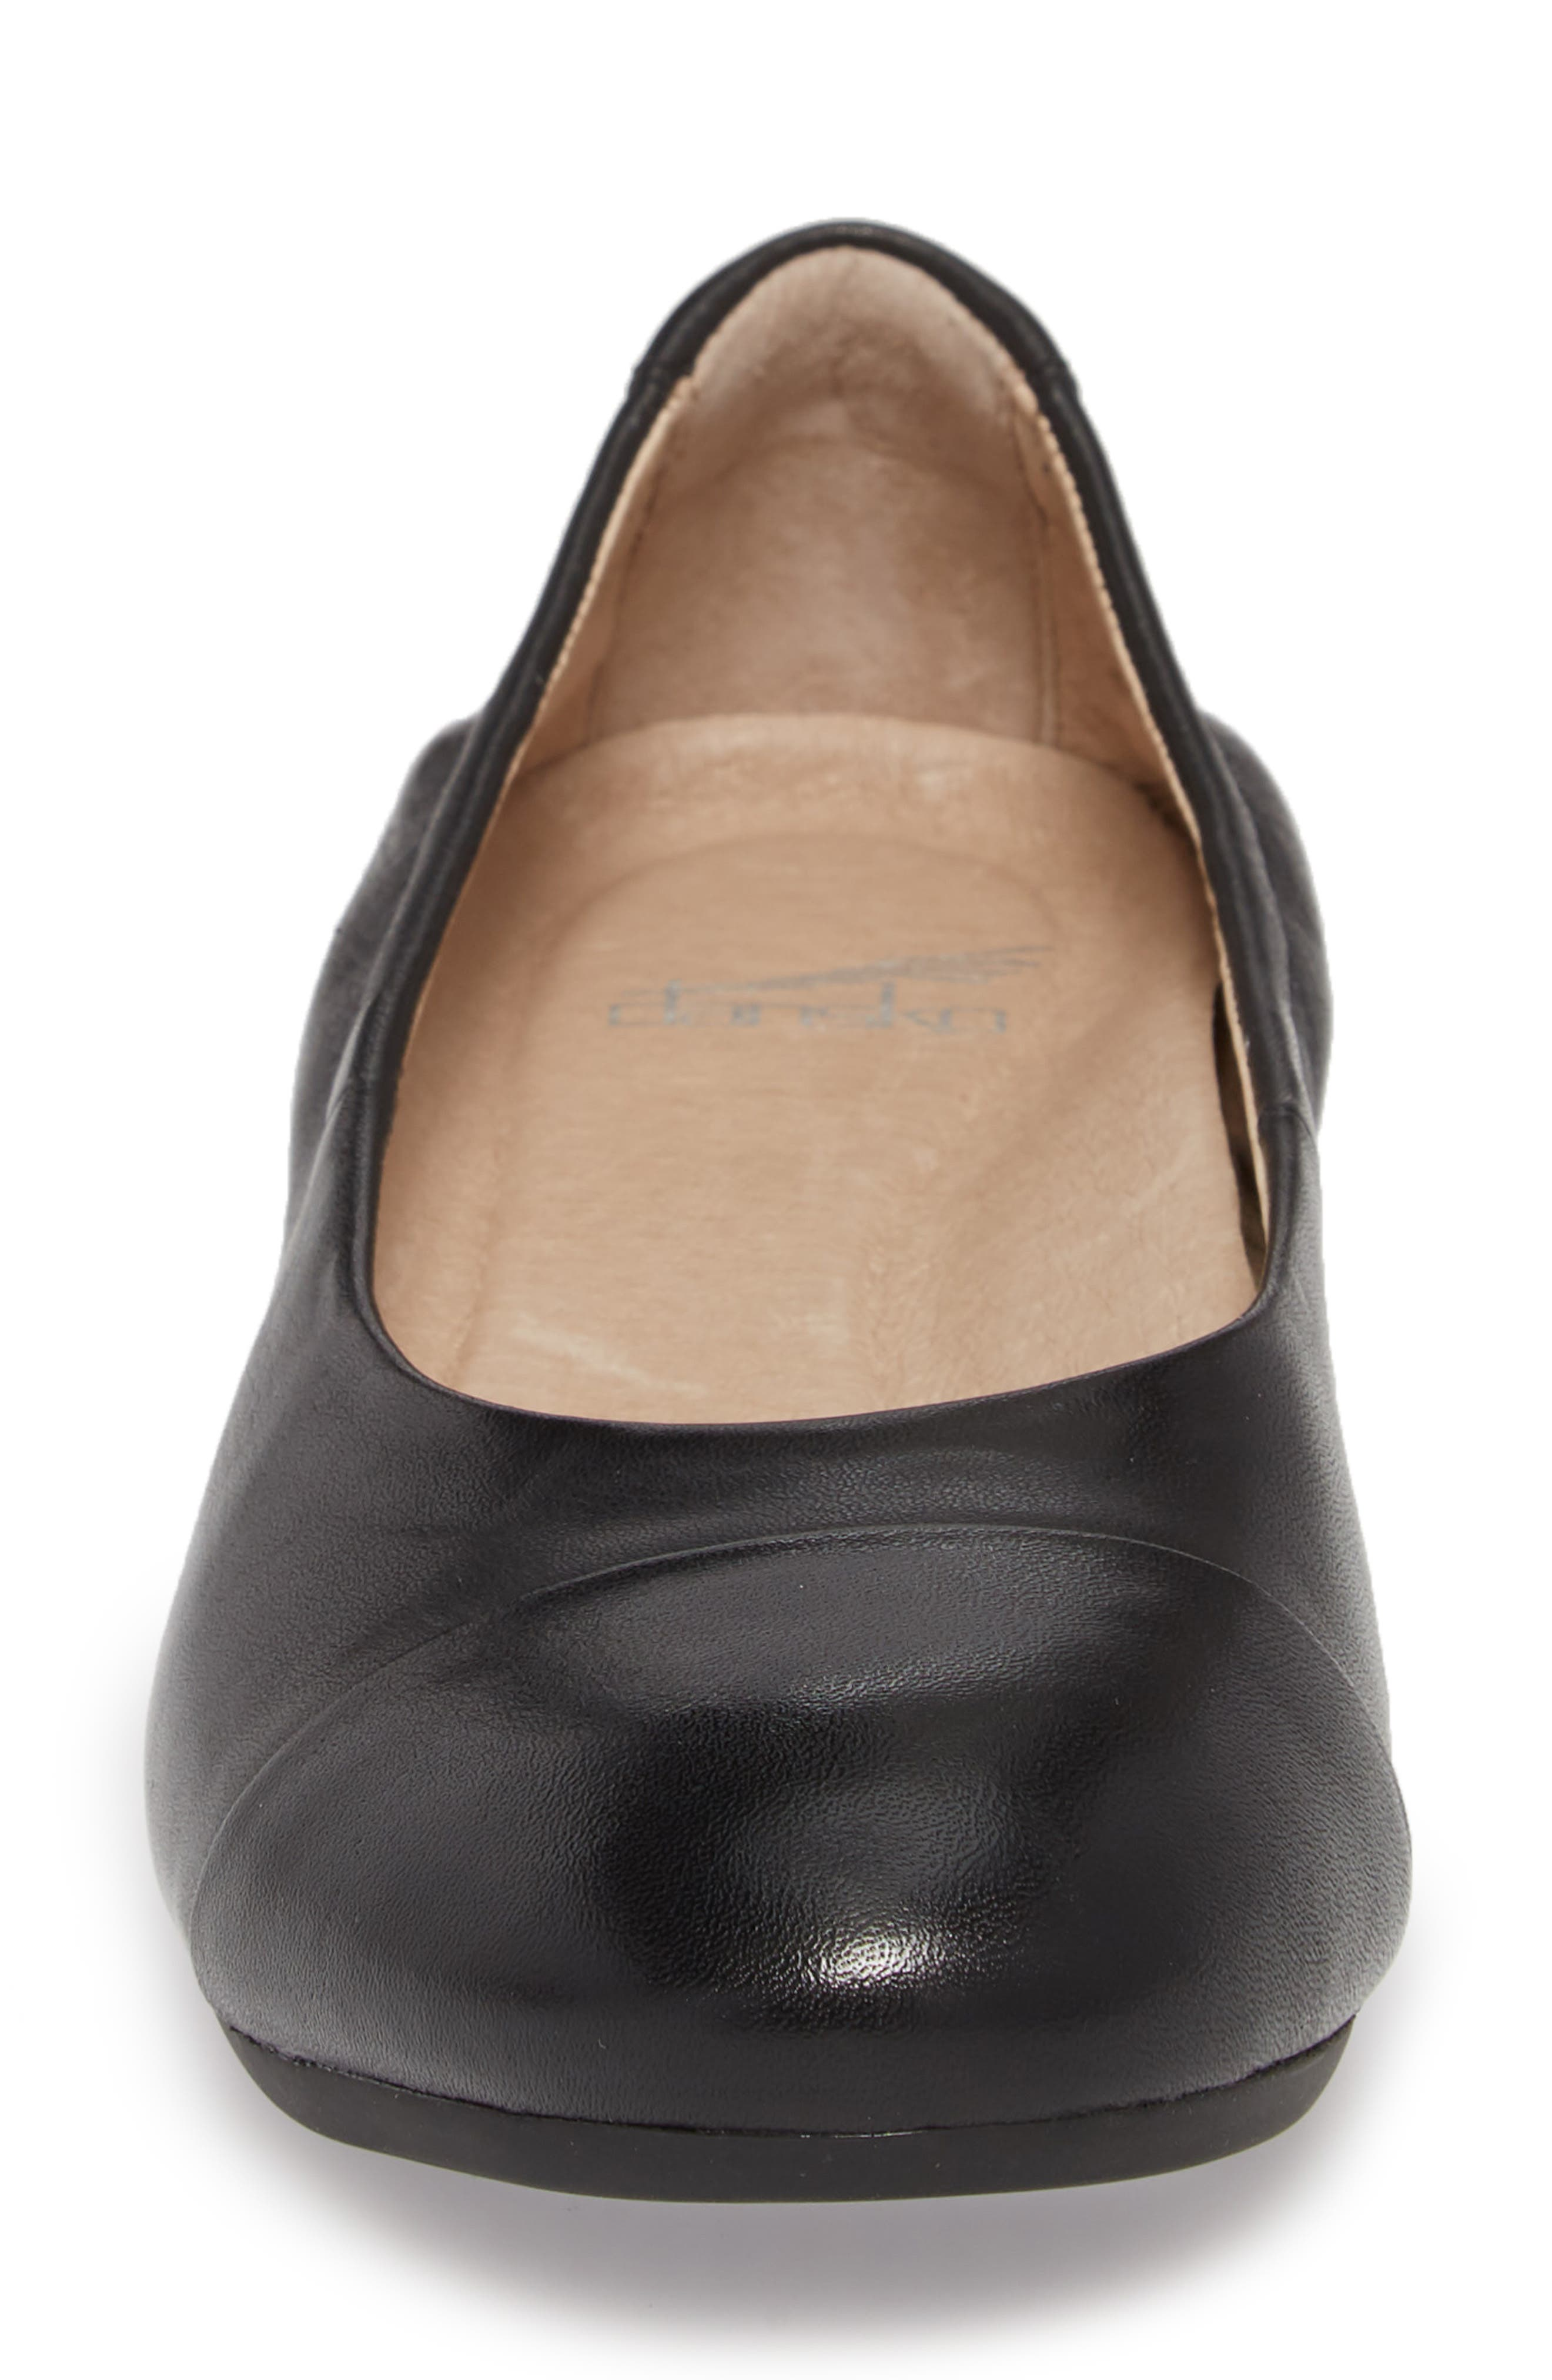 Lisanne Cap Toe Ballet Flat,                             Alternate thumbnail 4, color,                             BLACK MILLED LEATHER